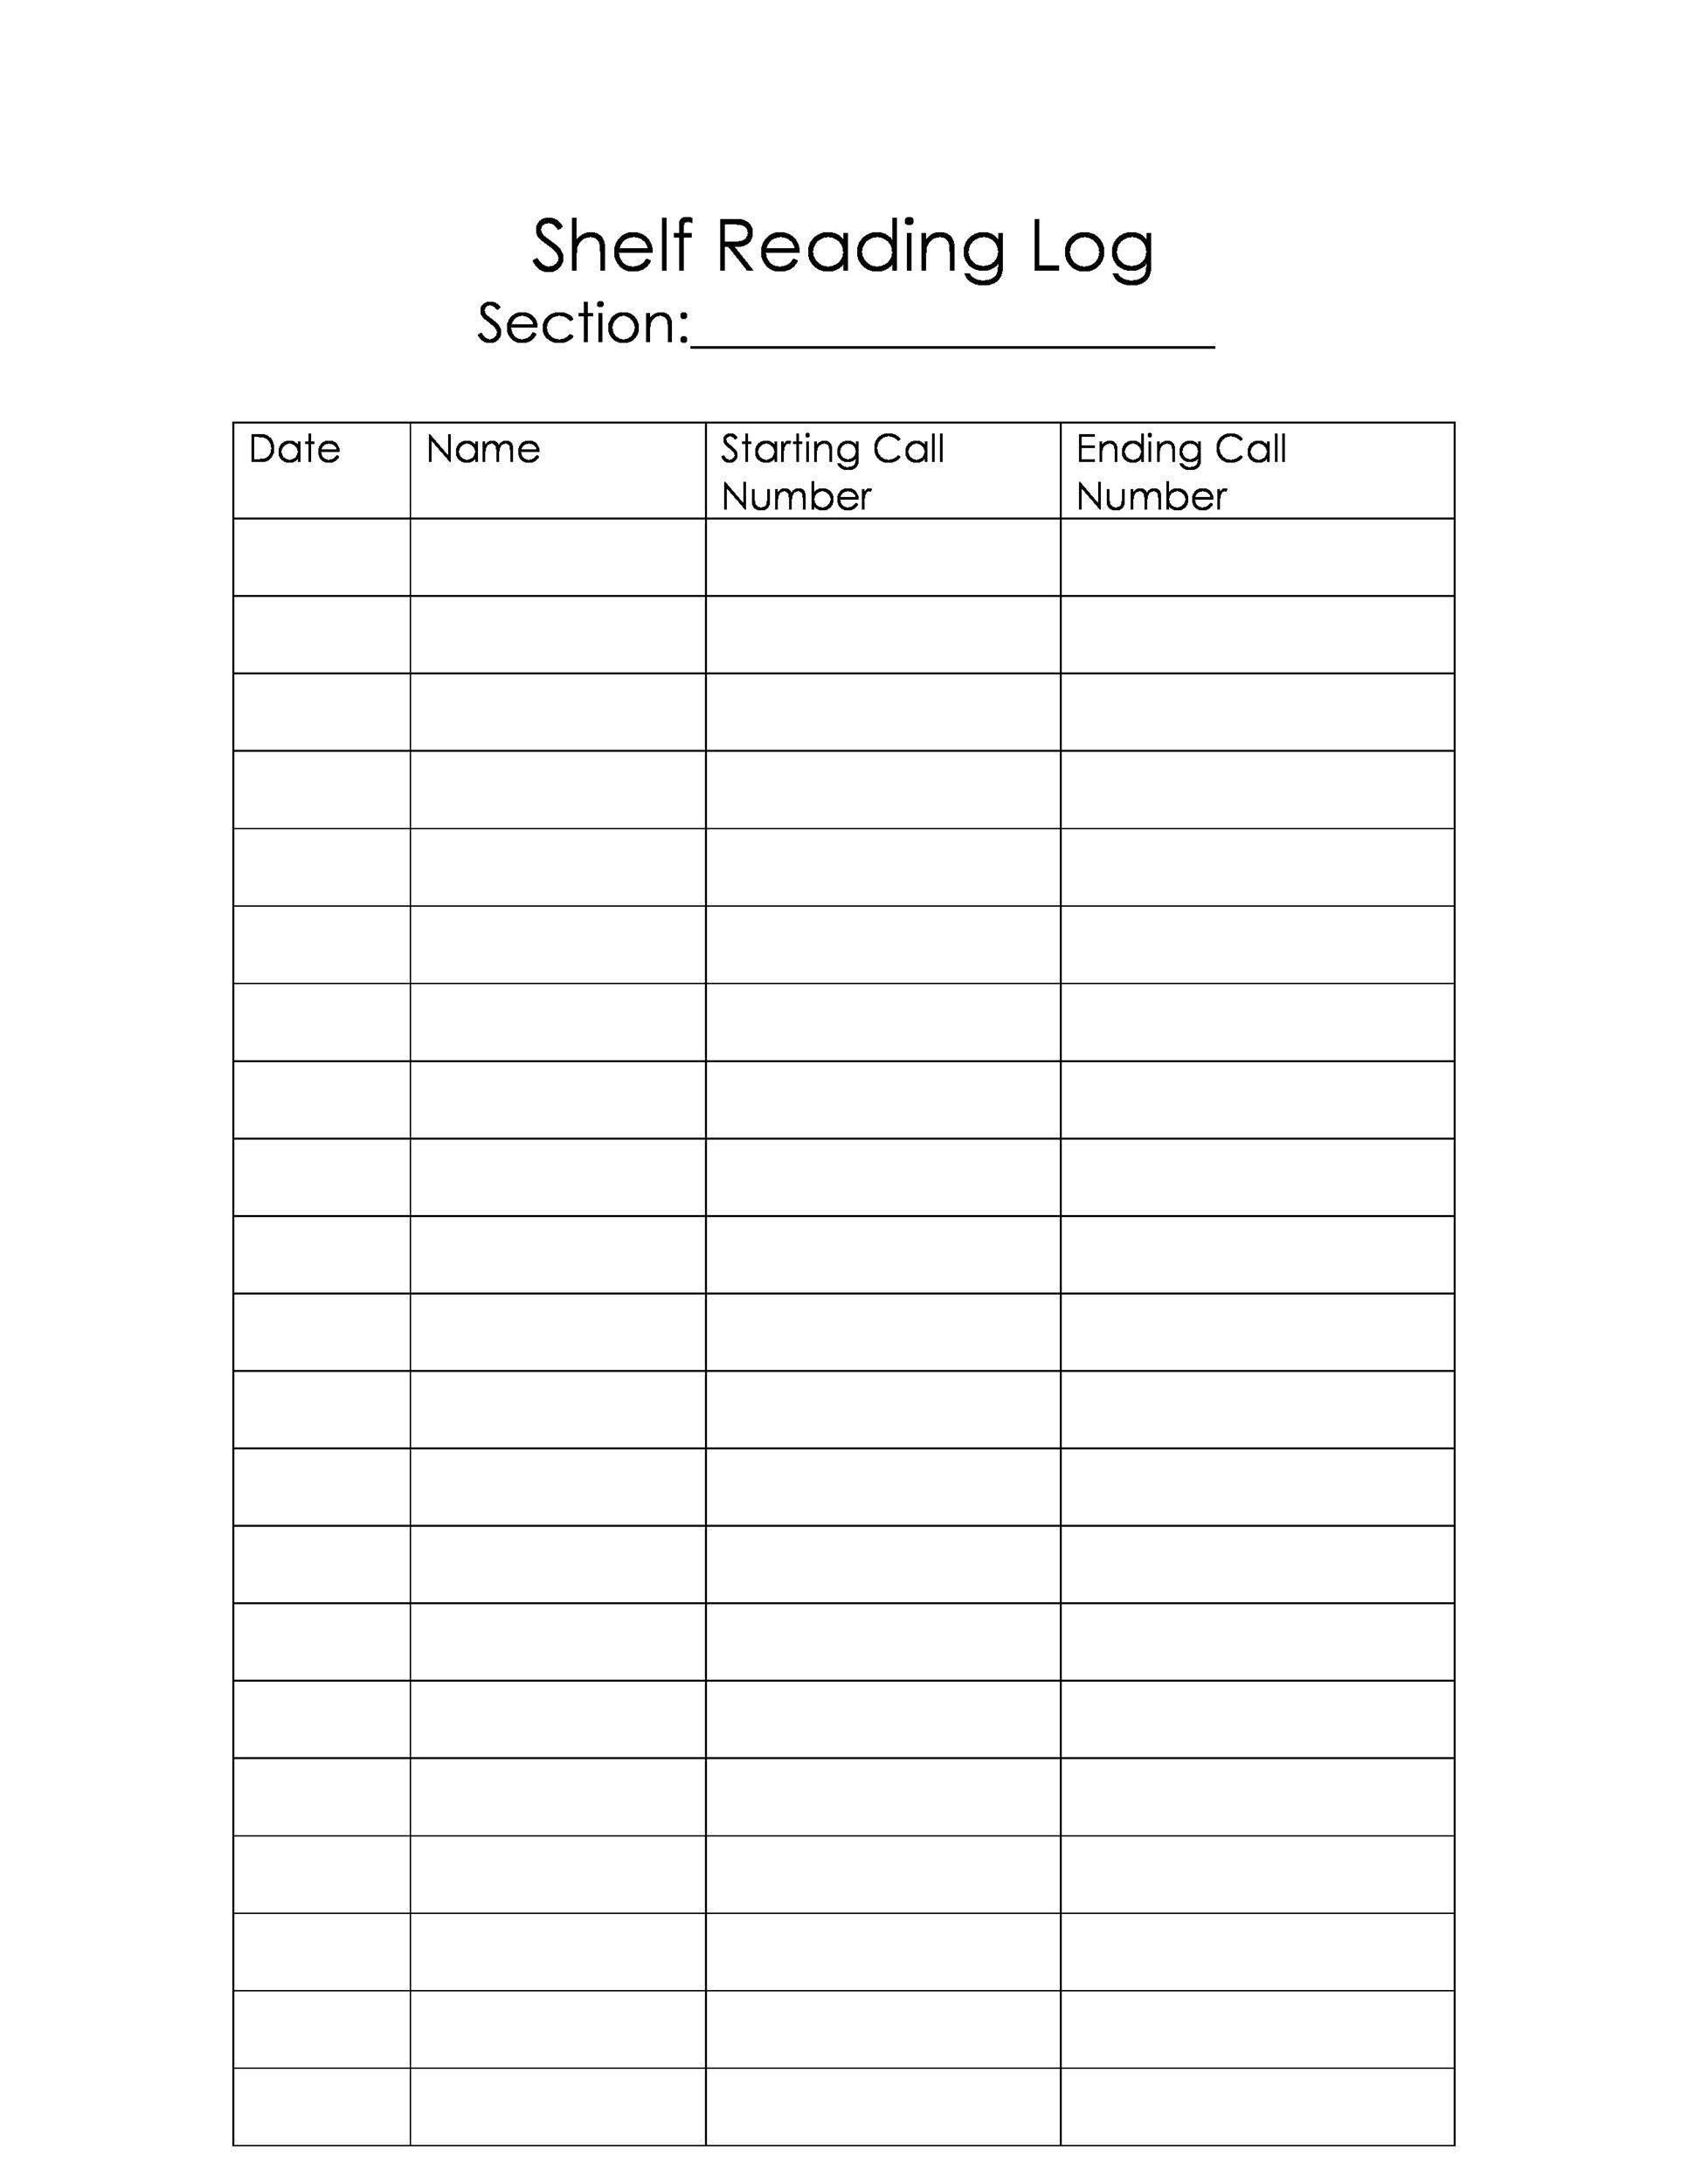 47 Printable Reading Log Templates For Kids, Middle School regarding Middle School Reading Log Template